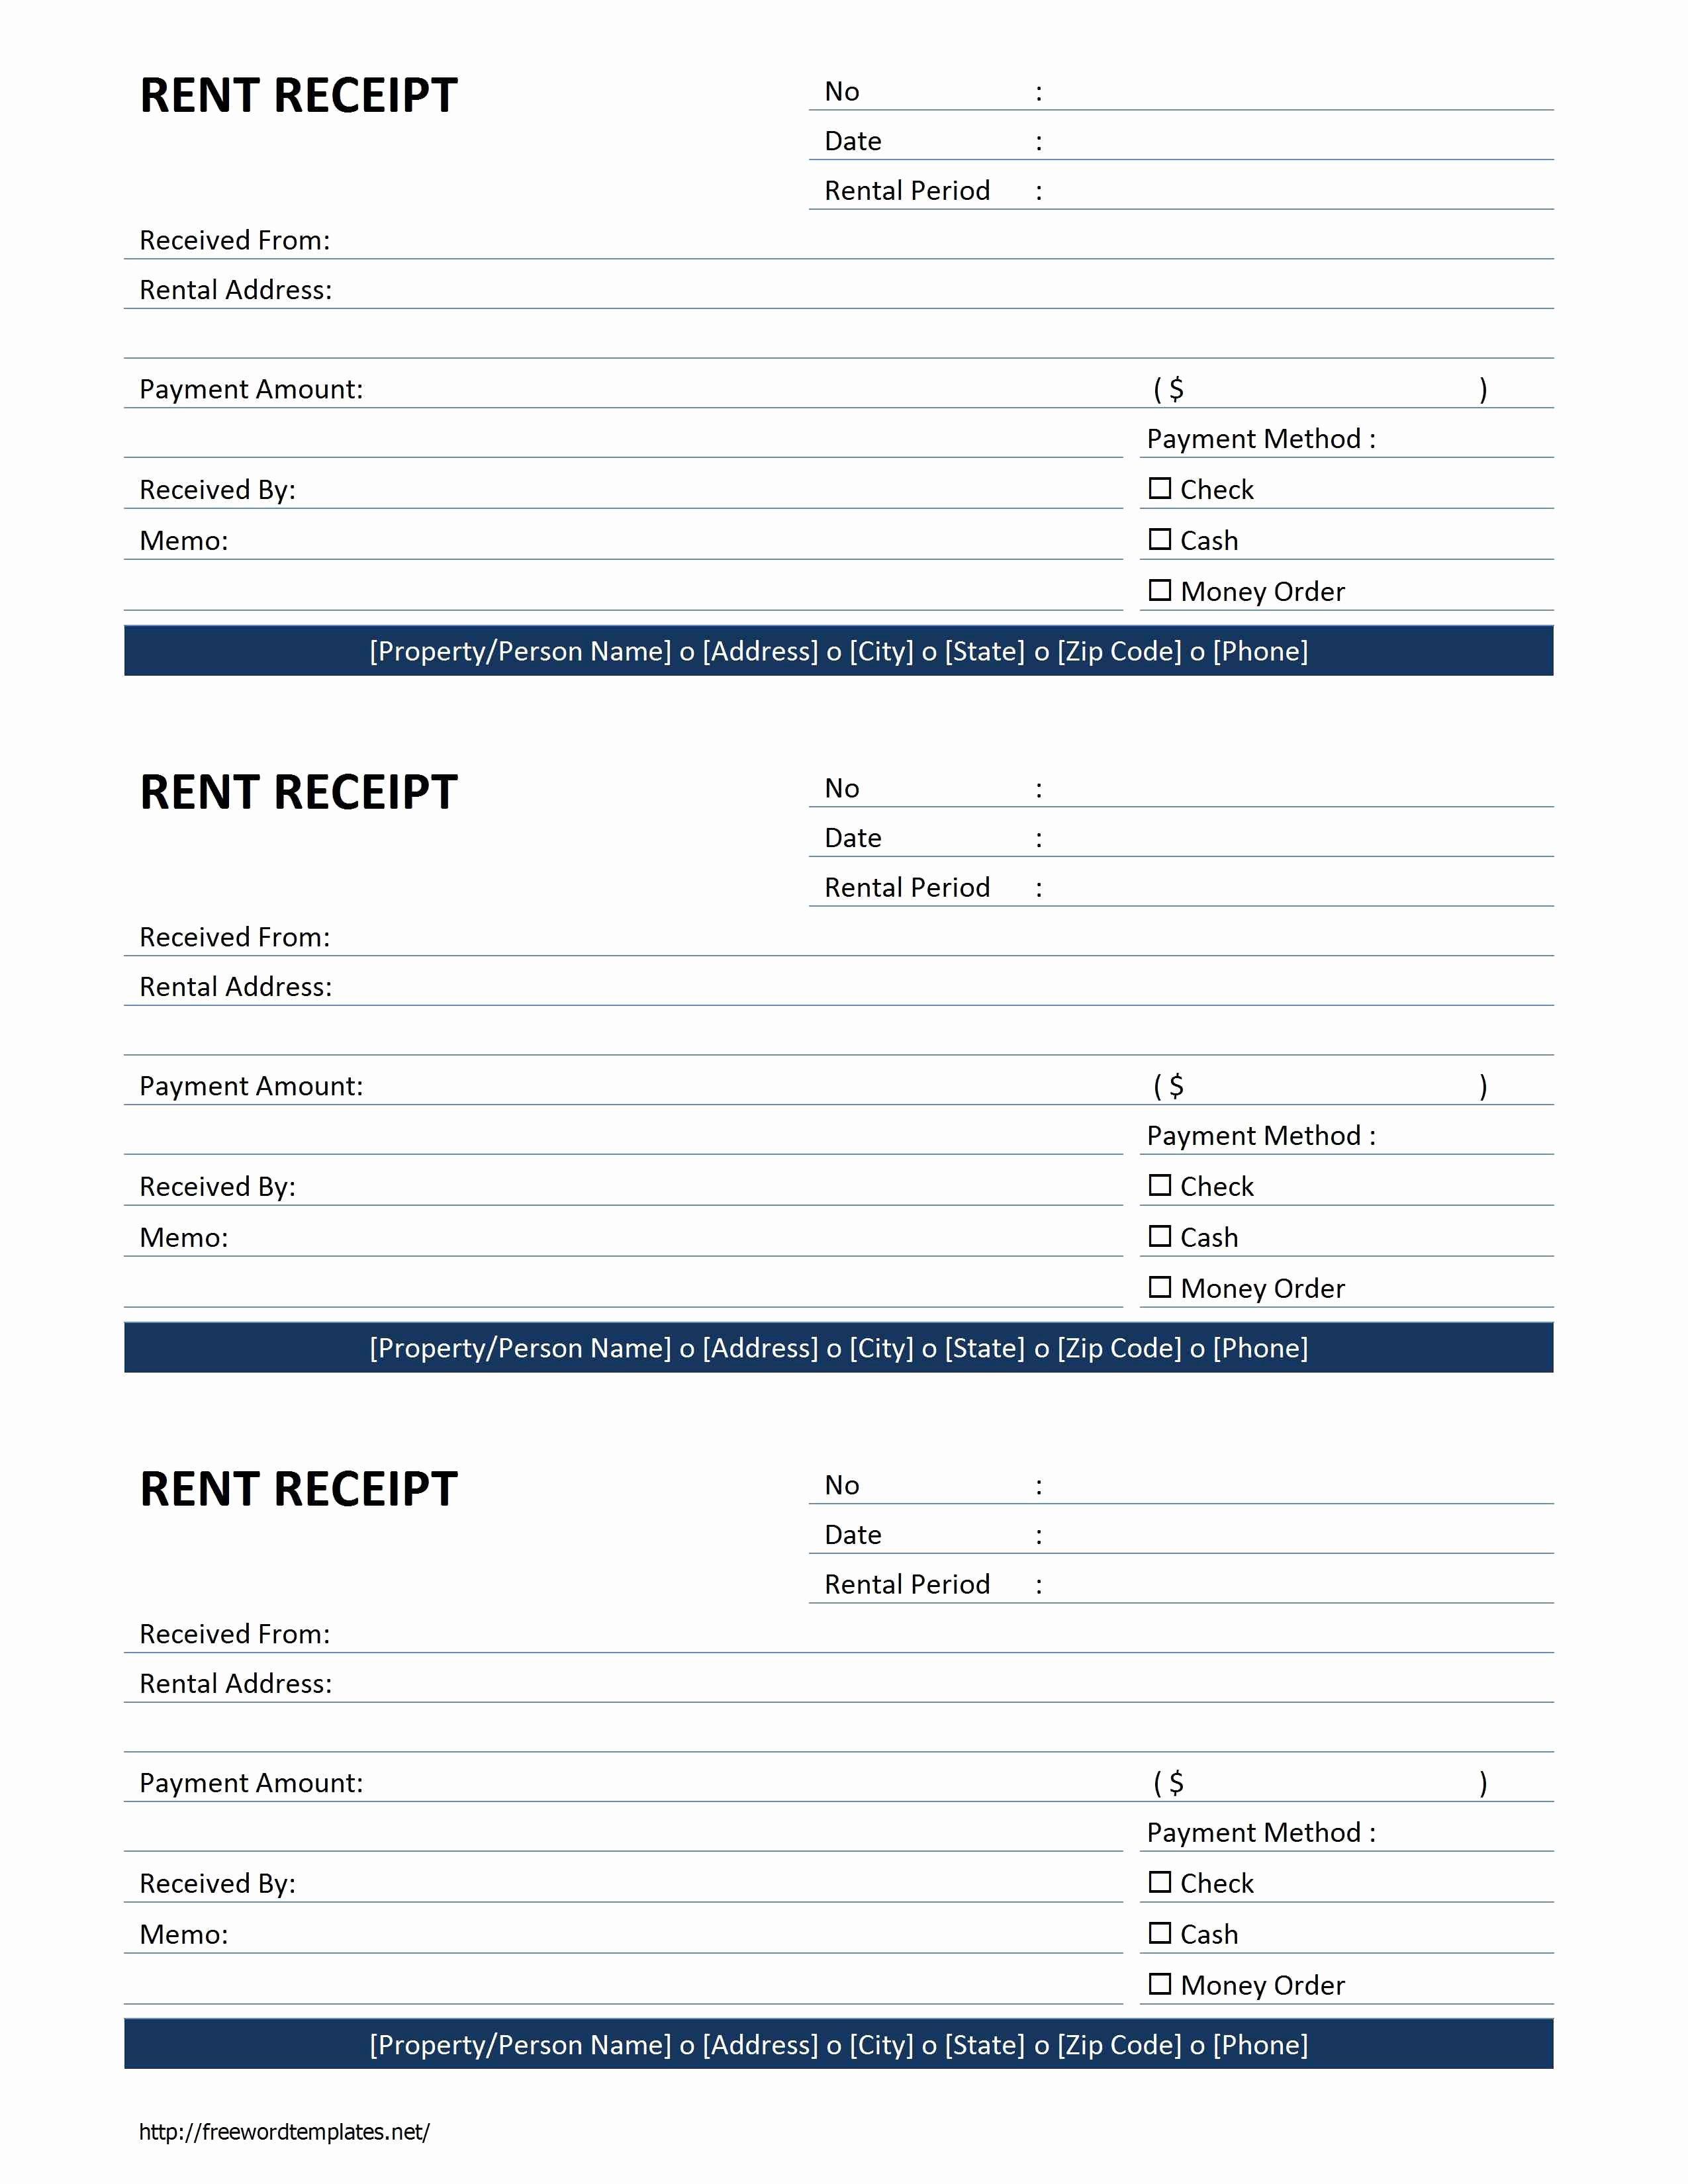 Car Rental Receipt Template Beautiful Free Rent Receipt Free Printable Documents